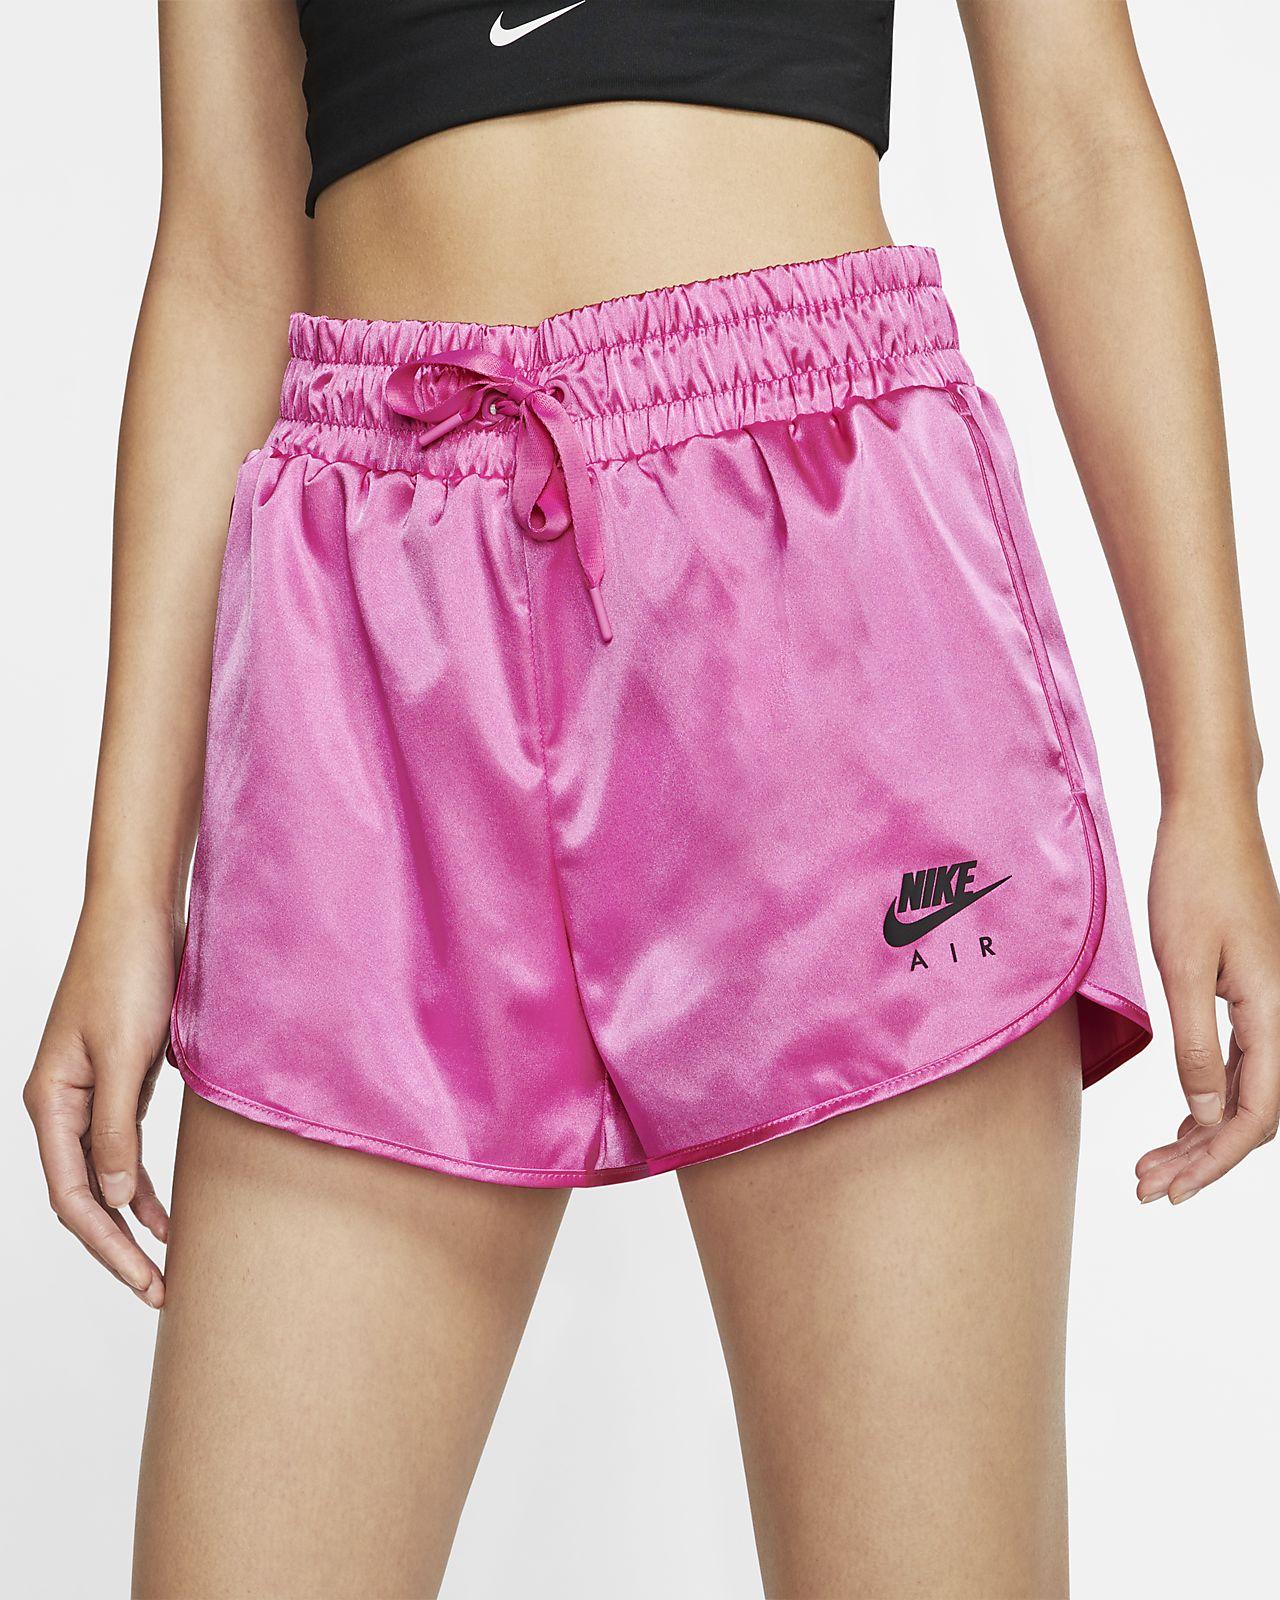 Nike für Damen Satin Shorts Air 7gvYbIyf6